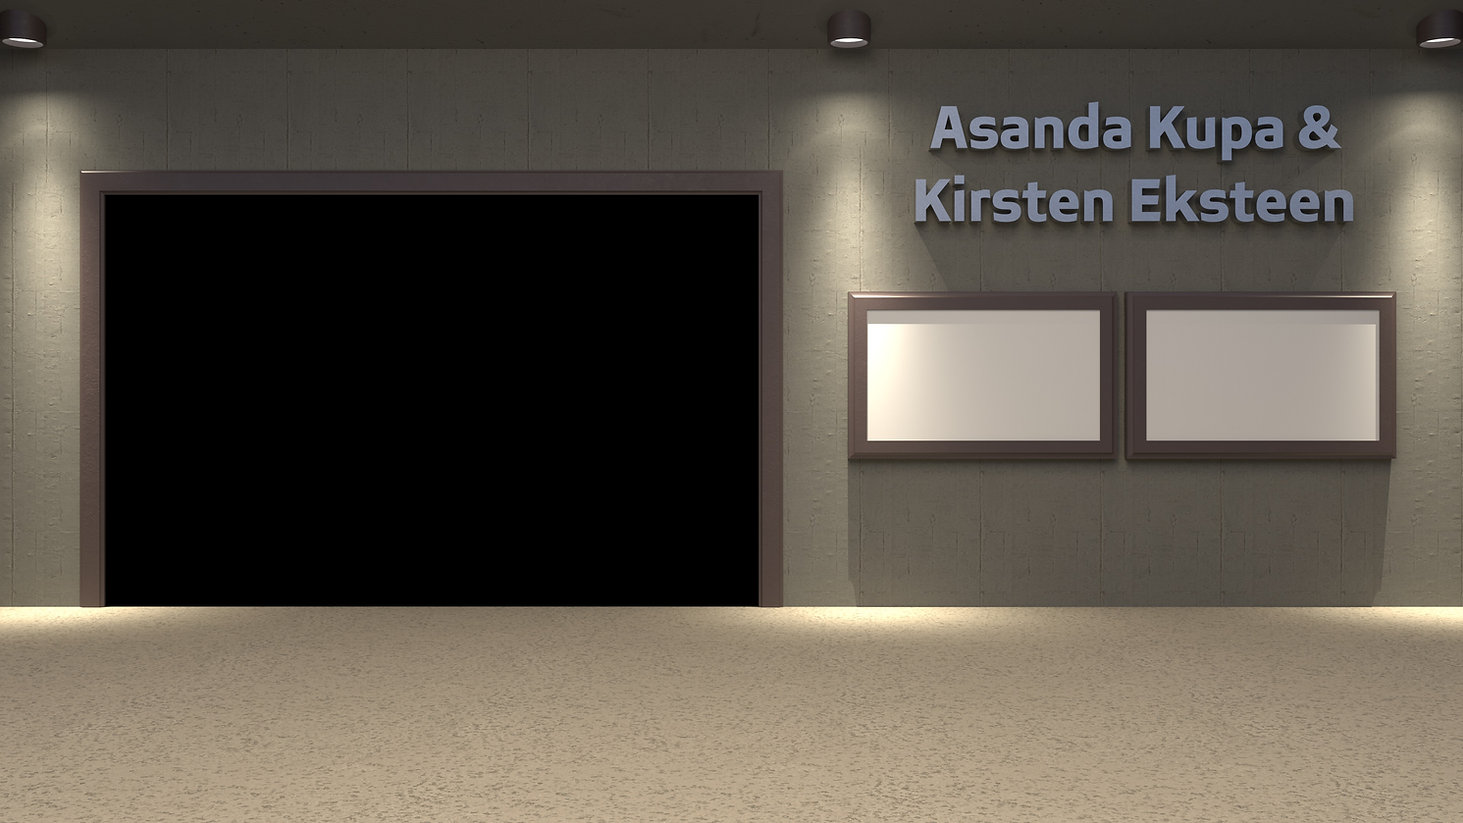 Asanda Kupa & Kirsten Eksteen Gallery Entrance.jpg